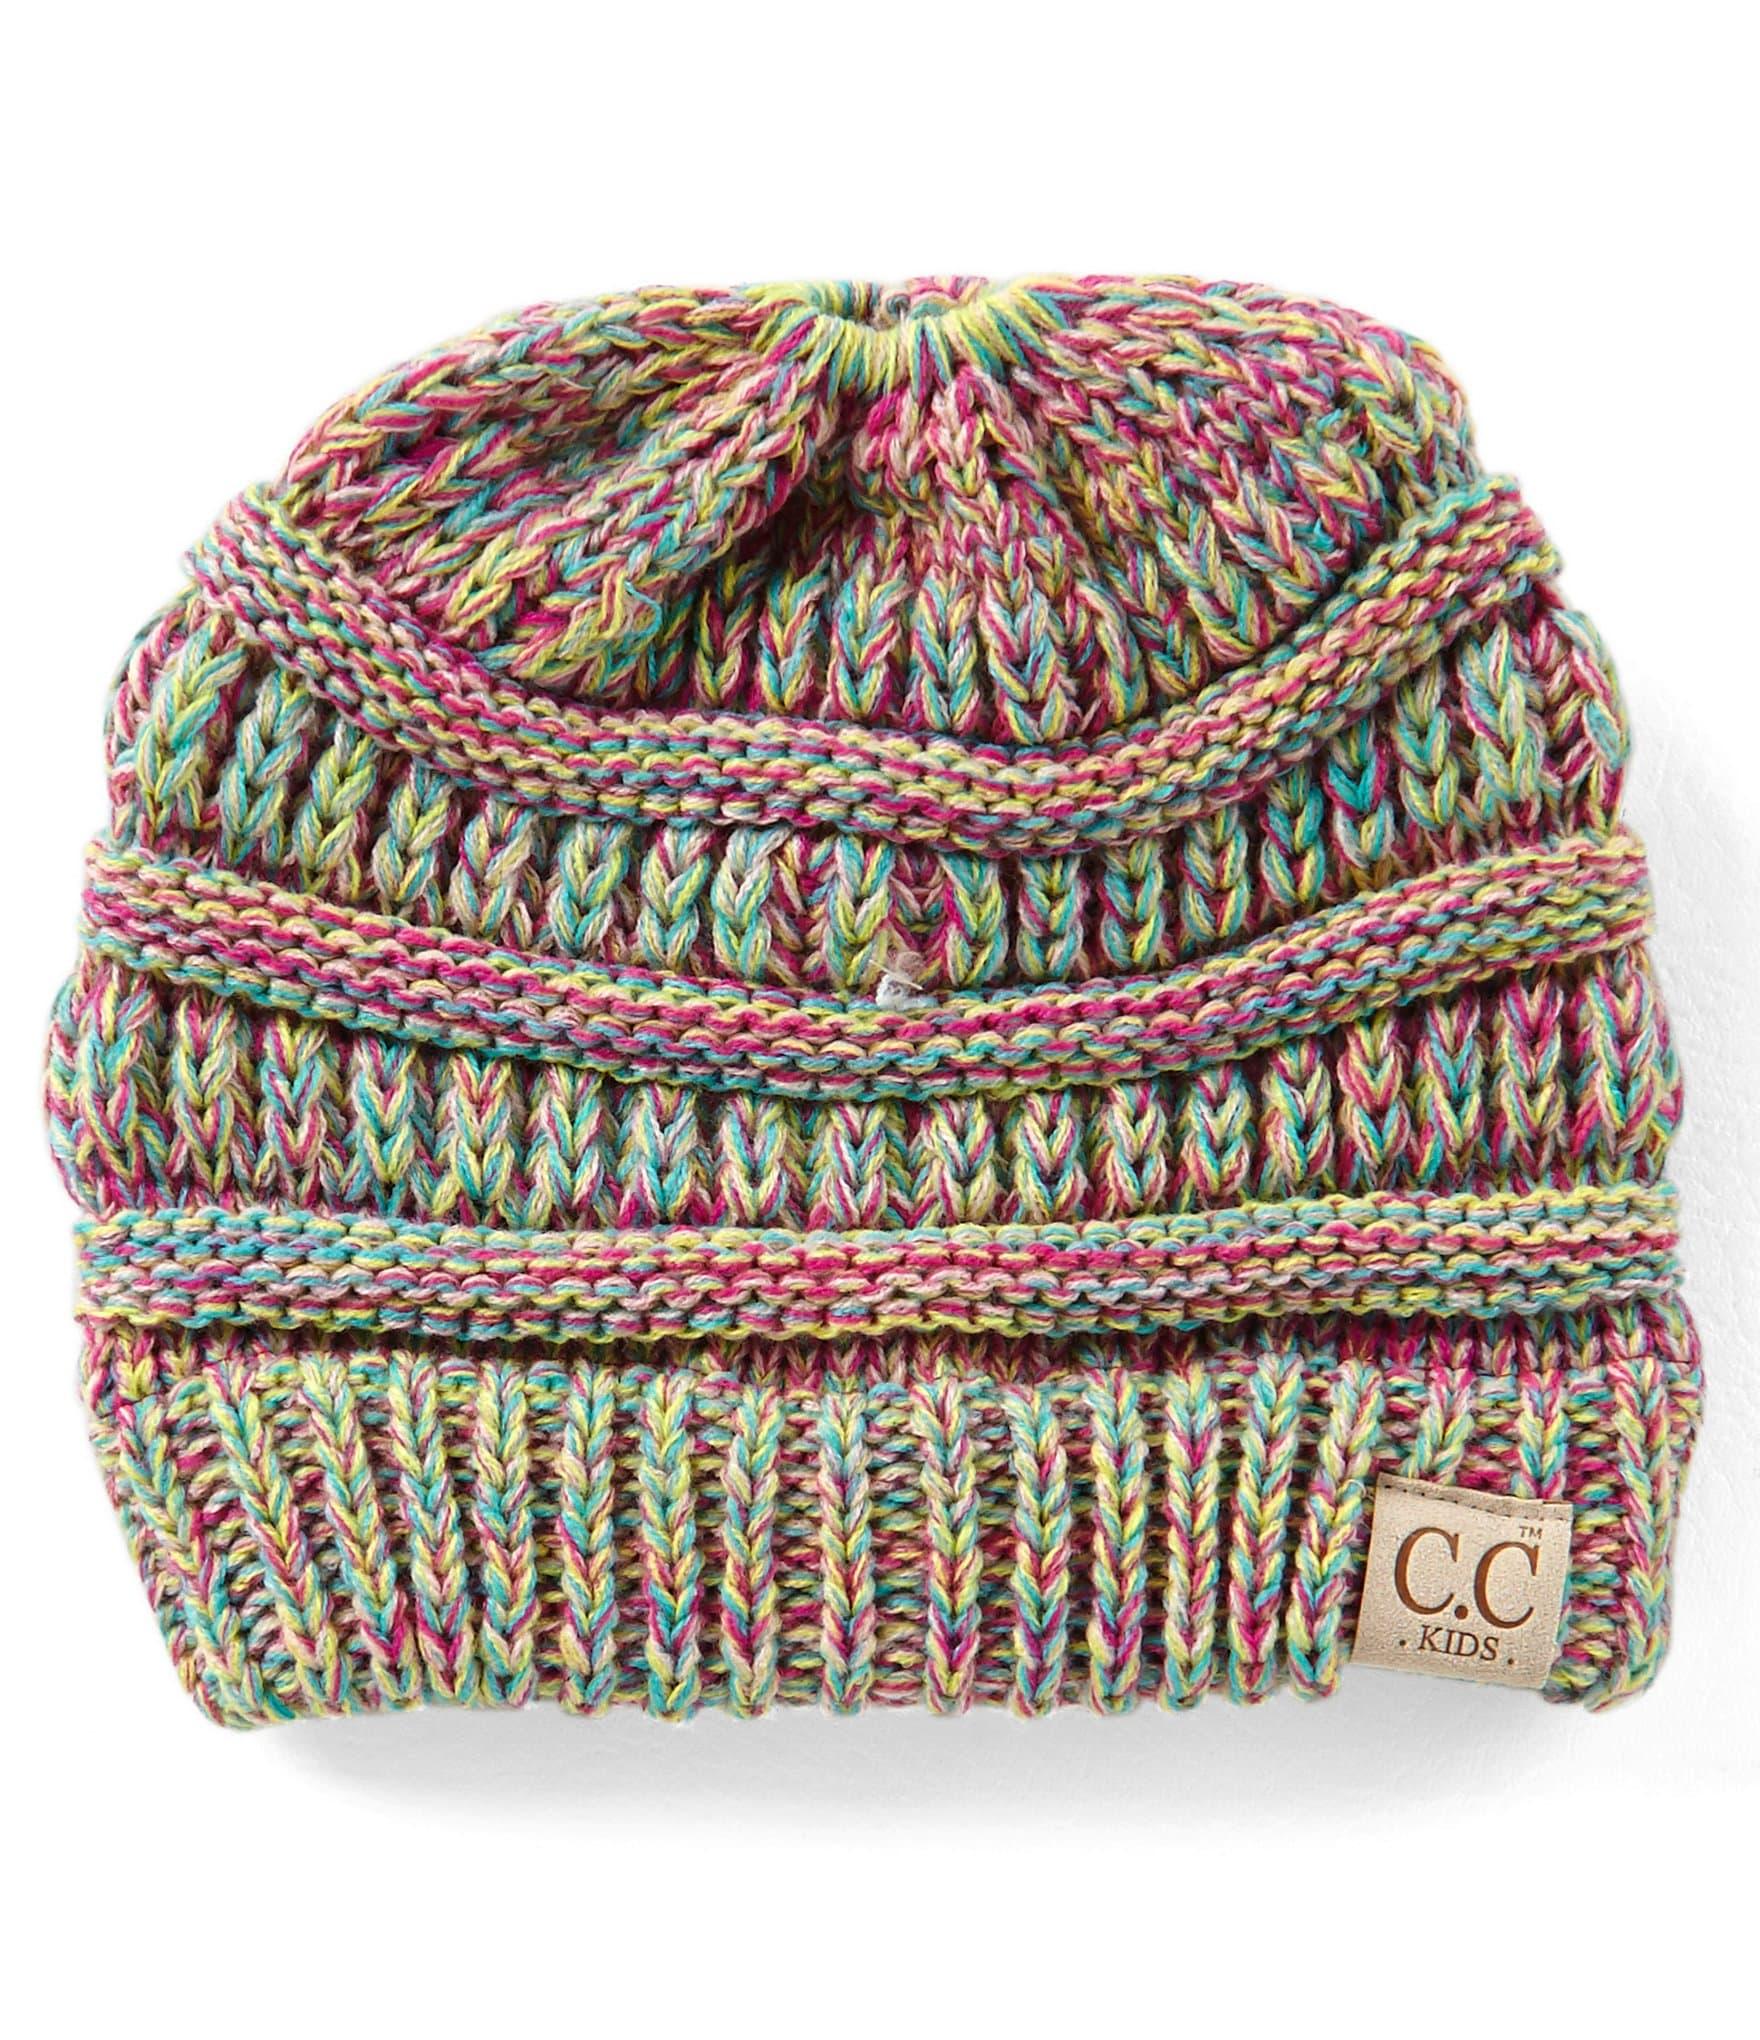 Dillard S Wedding Registry: CC Girl Knit Beanie Hat